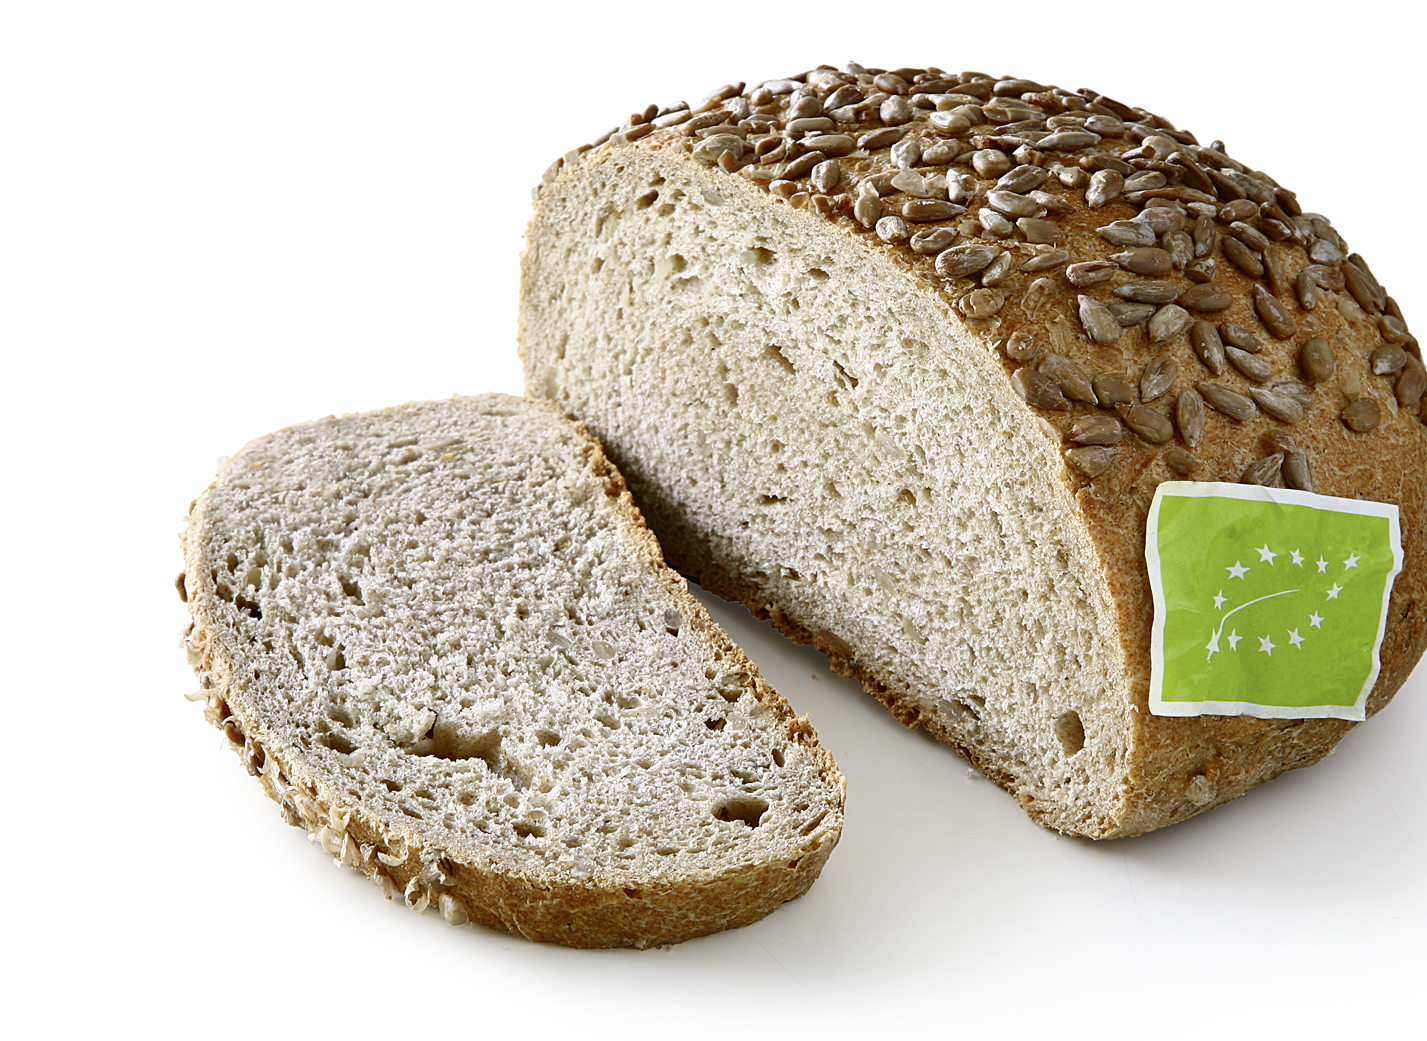 Organic Sunflower Bread DE-ÖKO-006 - ORGANIC Wheat mixed bread with 13% ORGANIC sunflower kernels and nature sourdough